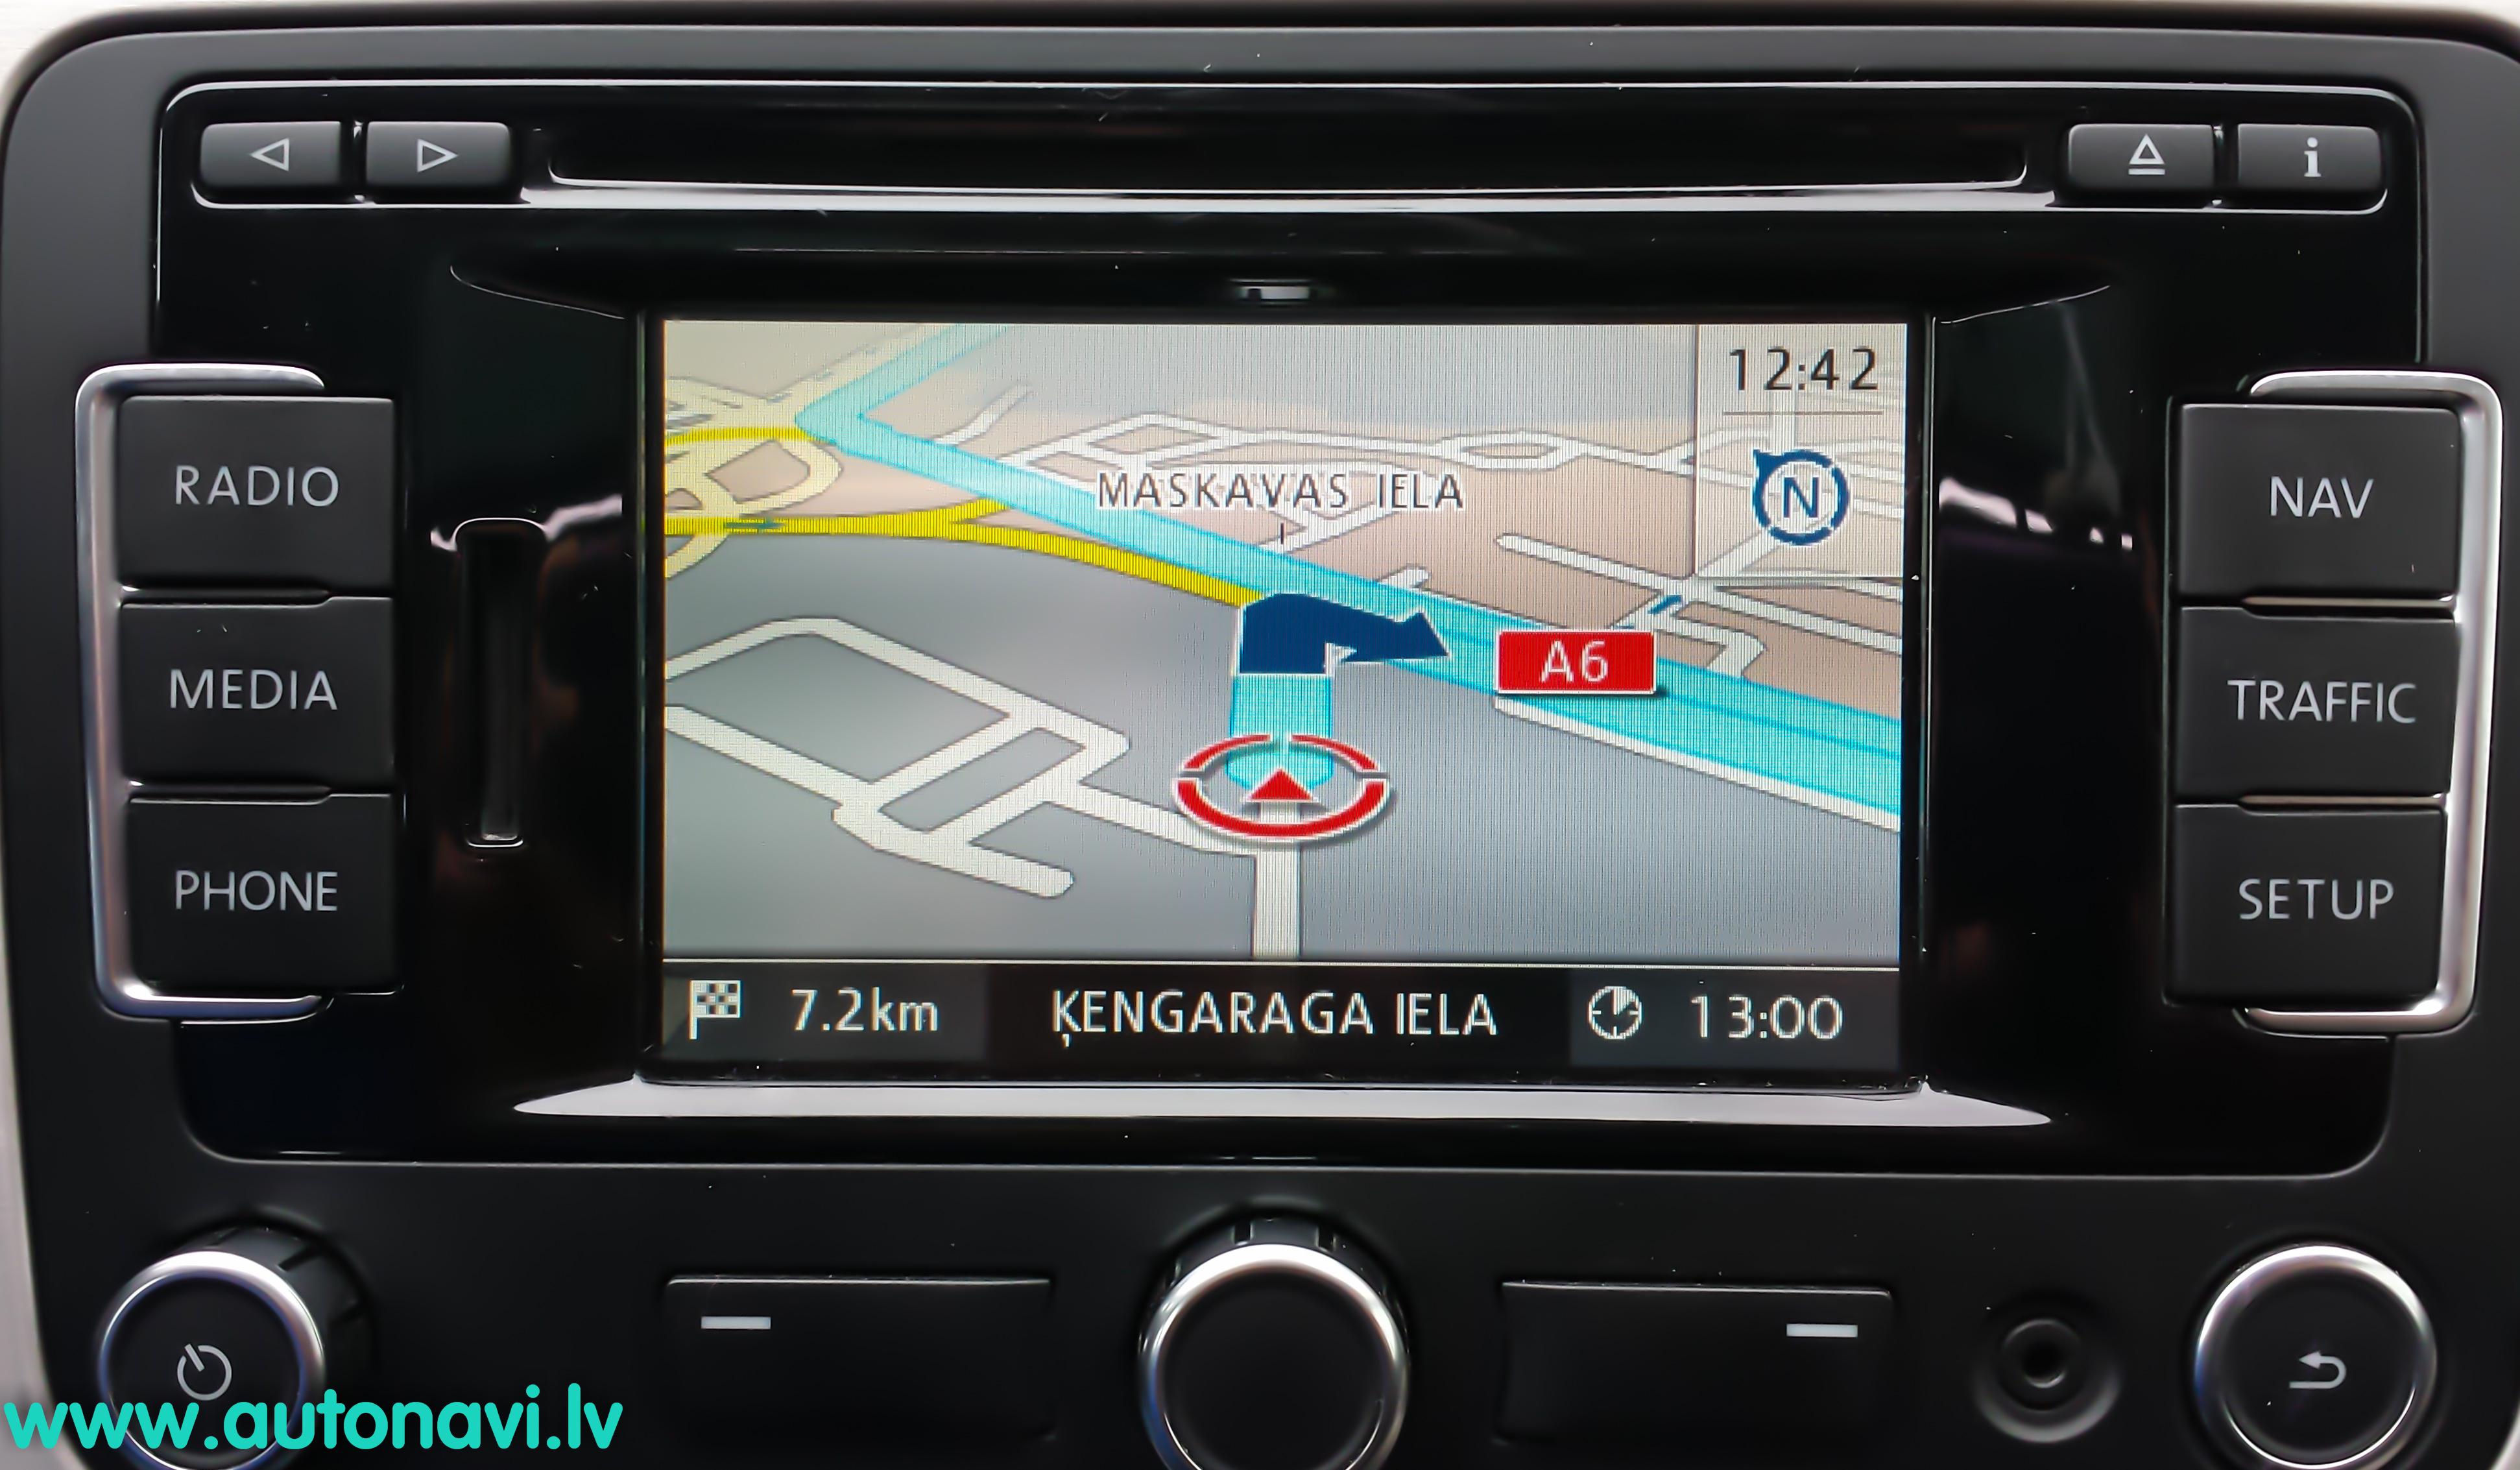 RNS 315 Latvijas GPS kartes autonavi.lv.jpg